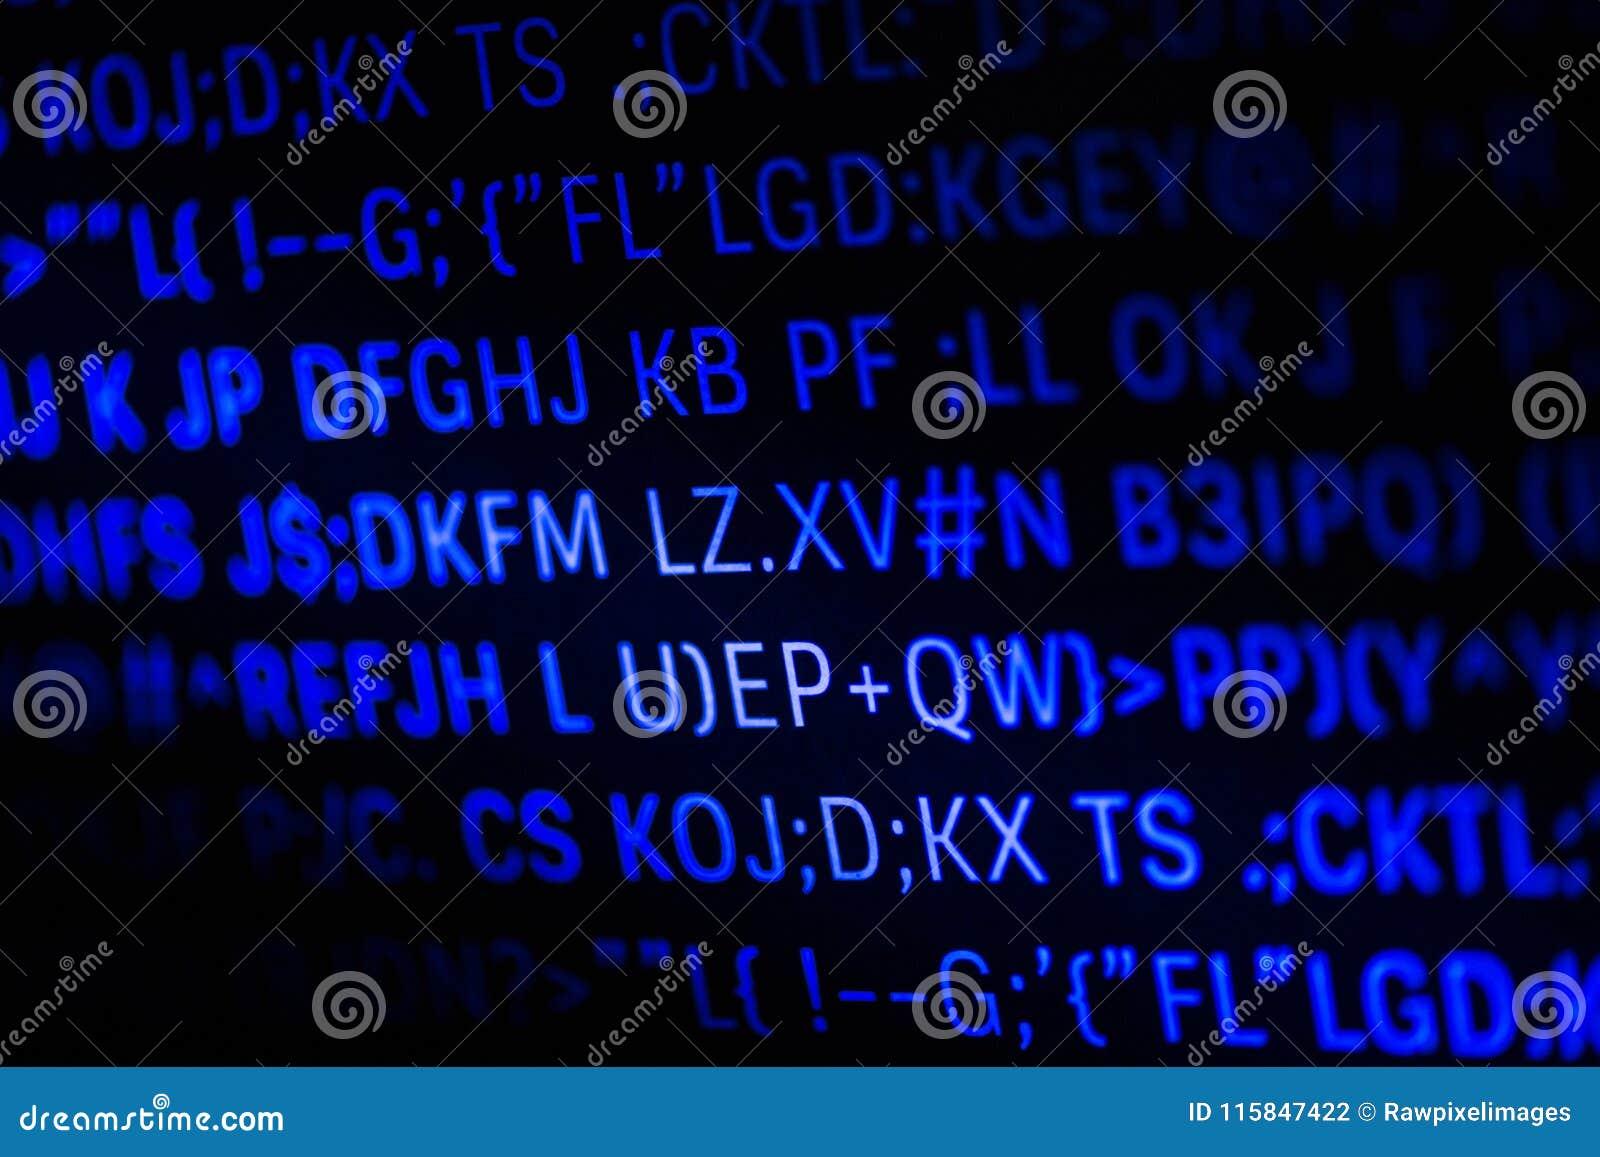 Closeup Of Programming Code And Language Stock Photo - Image